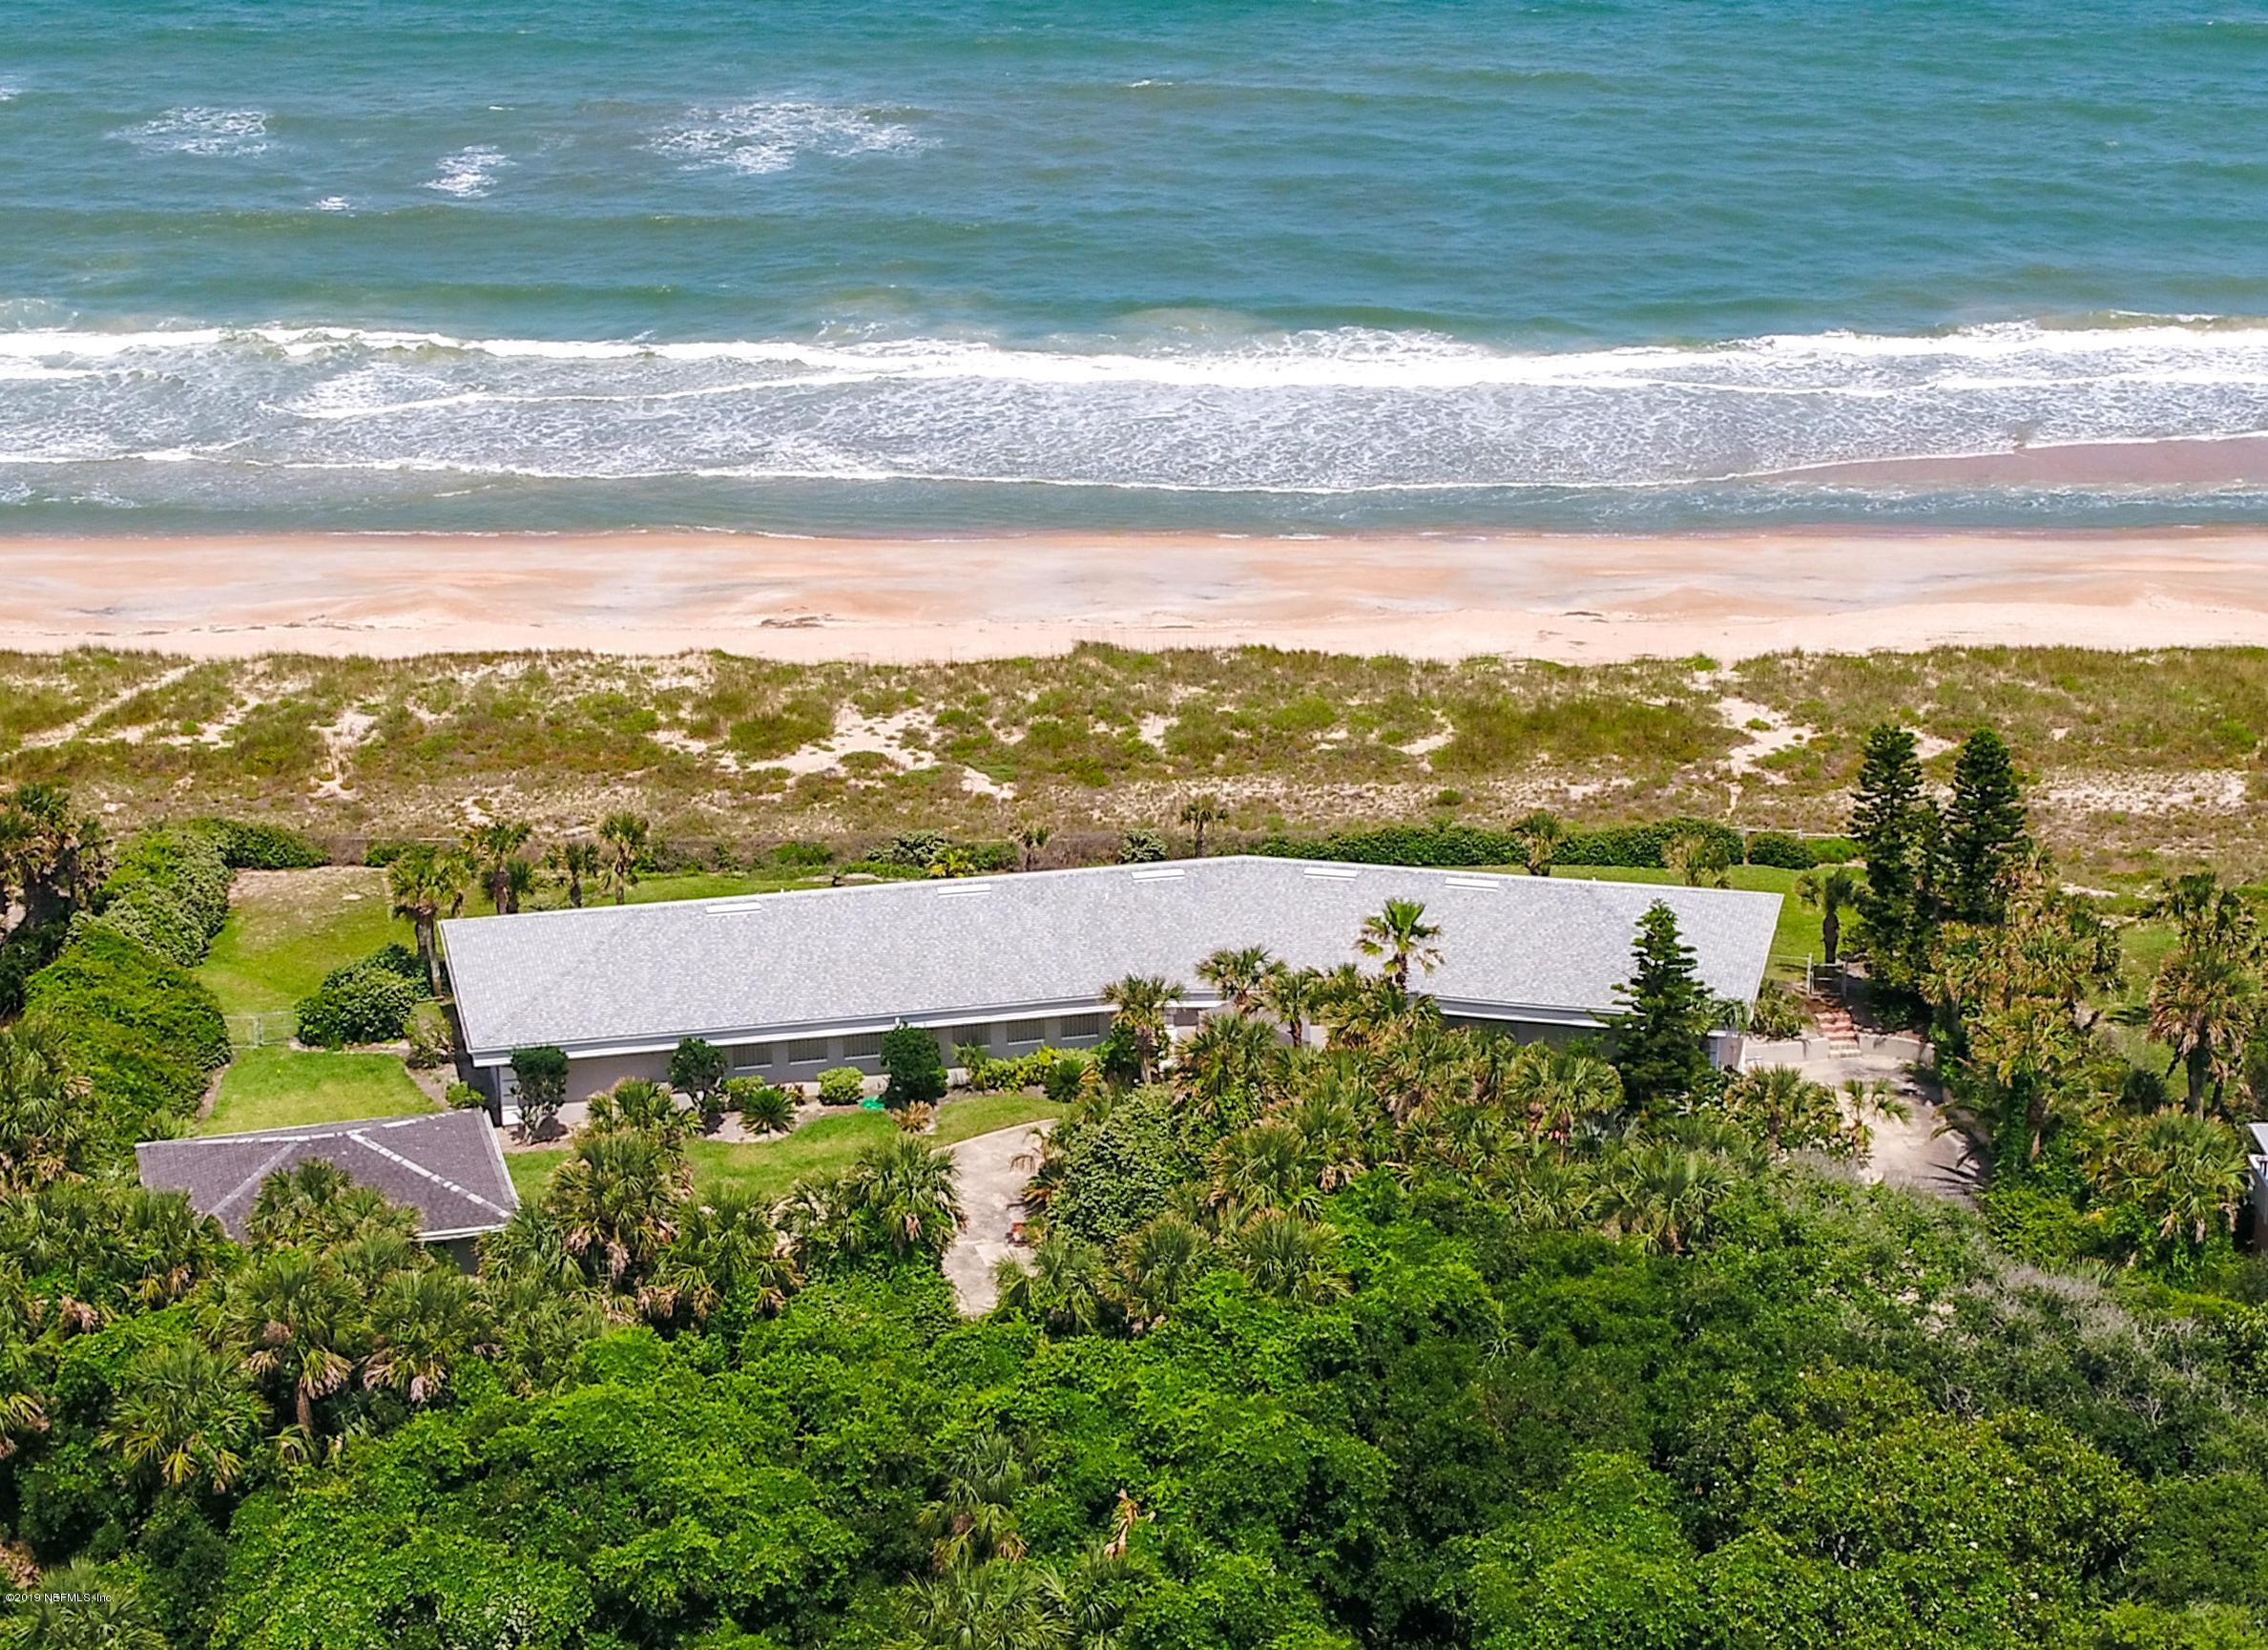 1305 PONTE VEDRA, PONTE VEDRA BEACH, FLORIDA 32082, 4 Bedrooms Bedrooms, ,4 BathroomsBathrooms,Residential,For sale,PONTE VEDRA,995406